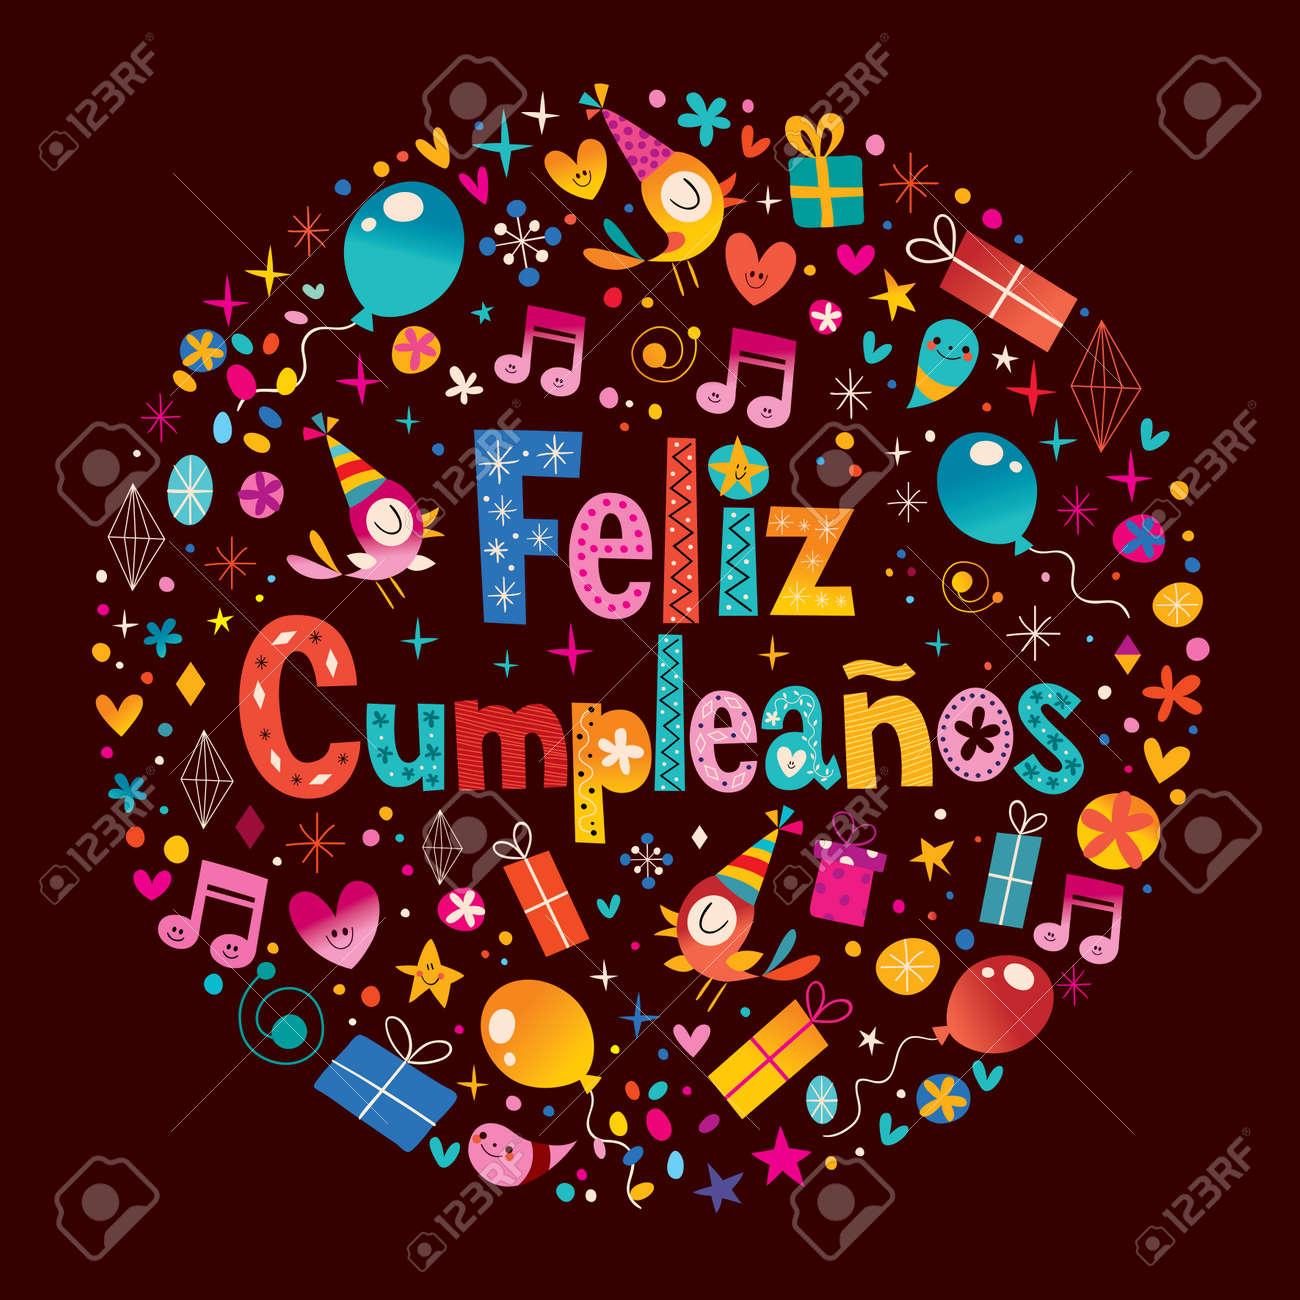 Feliz cumpleanos happy birthday in spanish greeting card with feliz cumpleanos happy birthday in spanish greeting card with circle composition stock vector 54725379 m4hsunfo